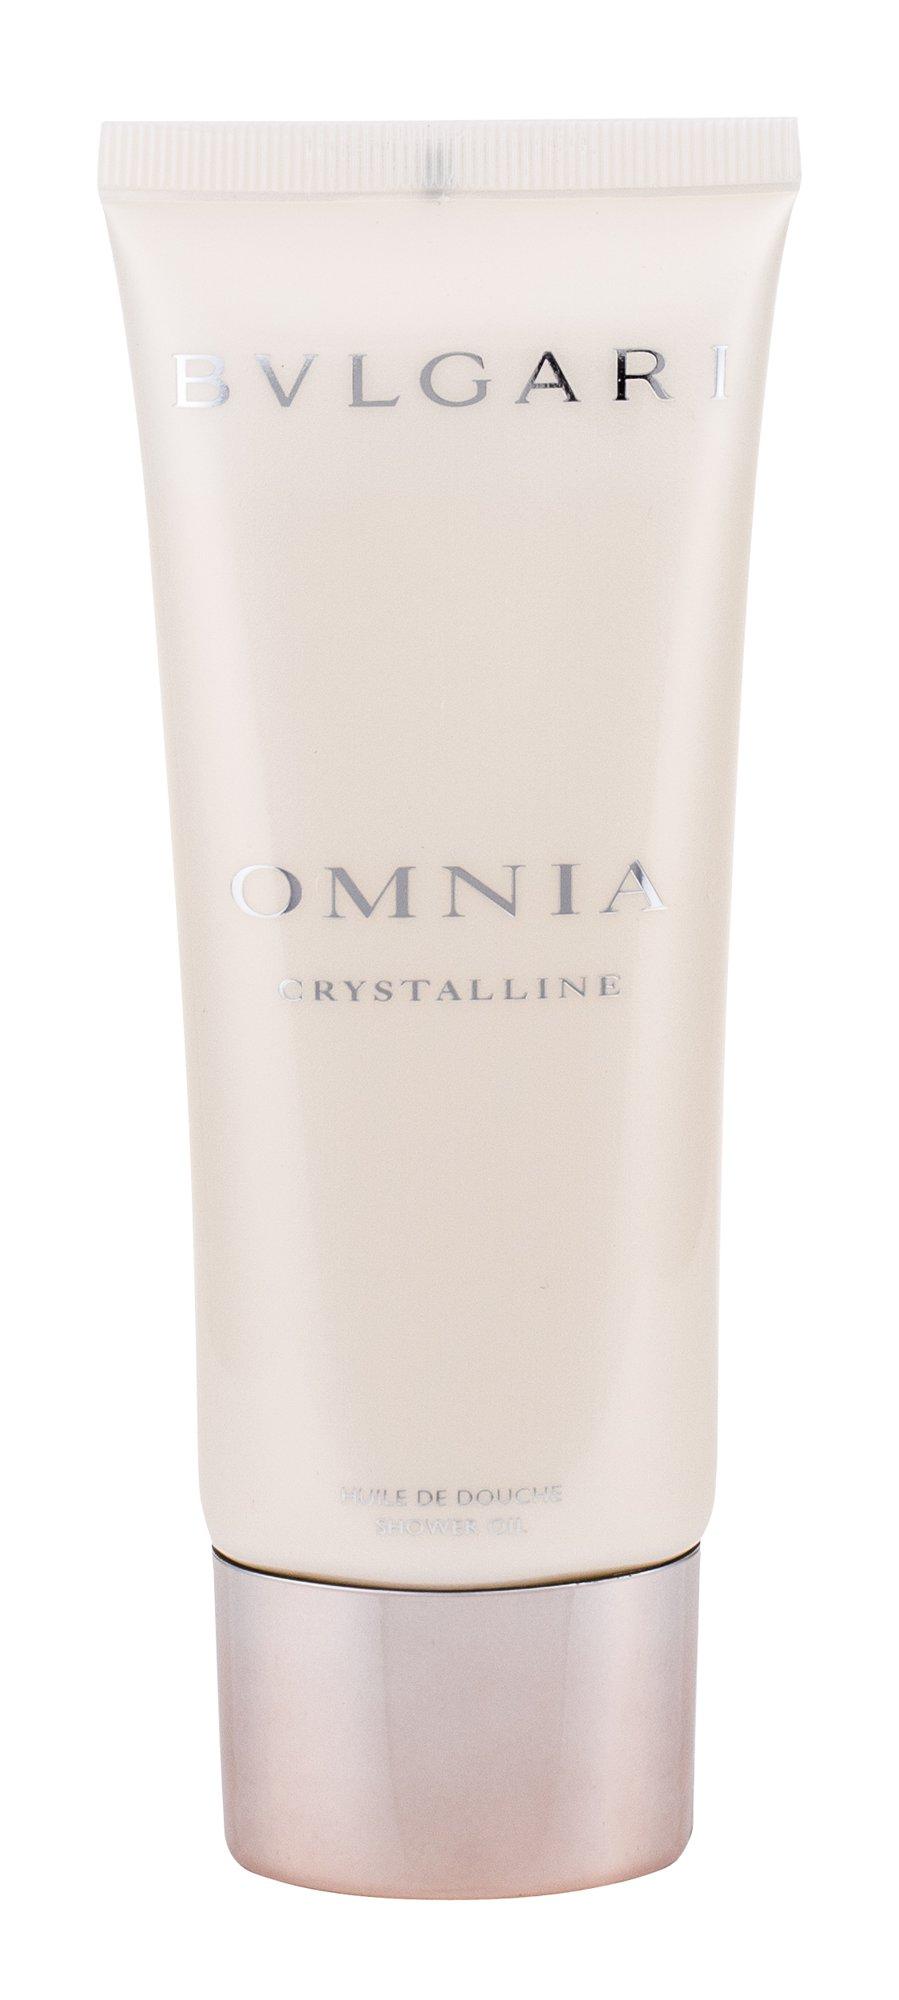 Bvlgari Omnia Crystalline, Tusoló olaj 100ml